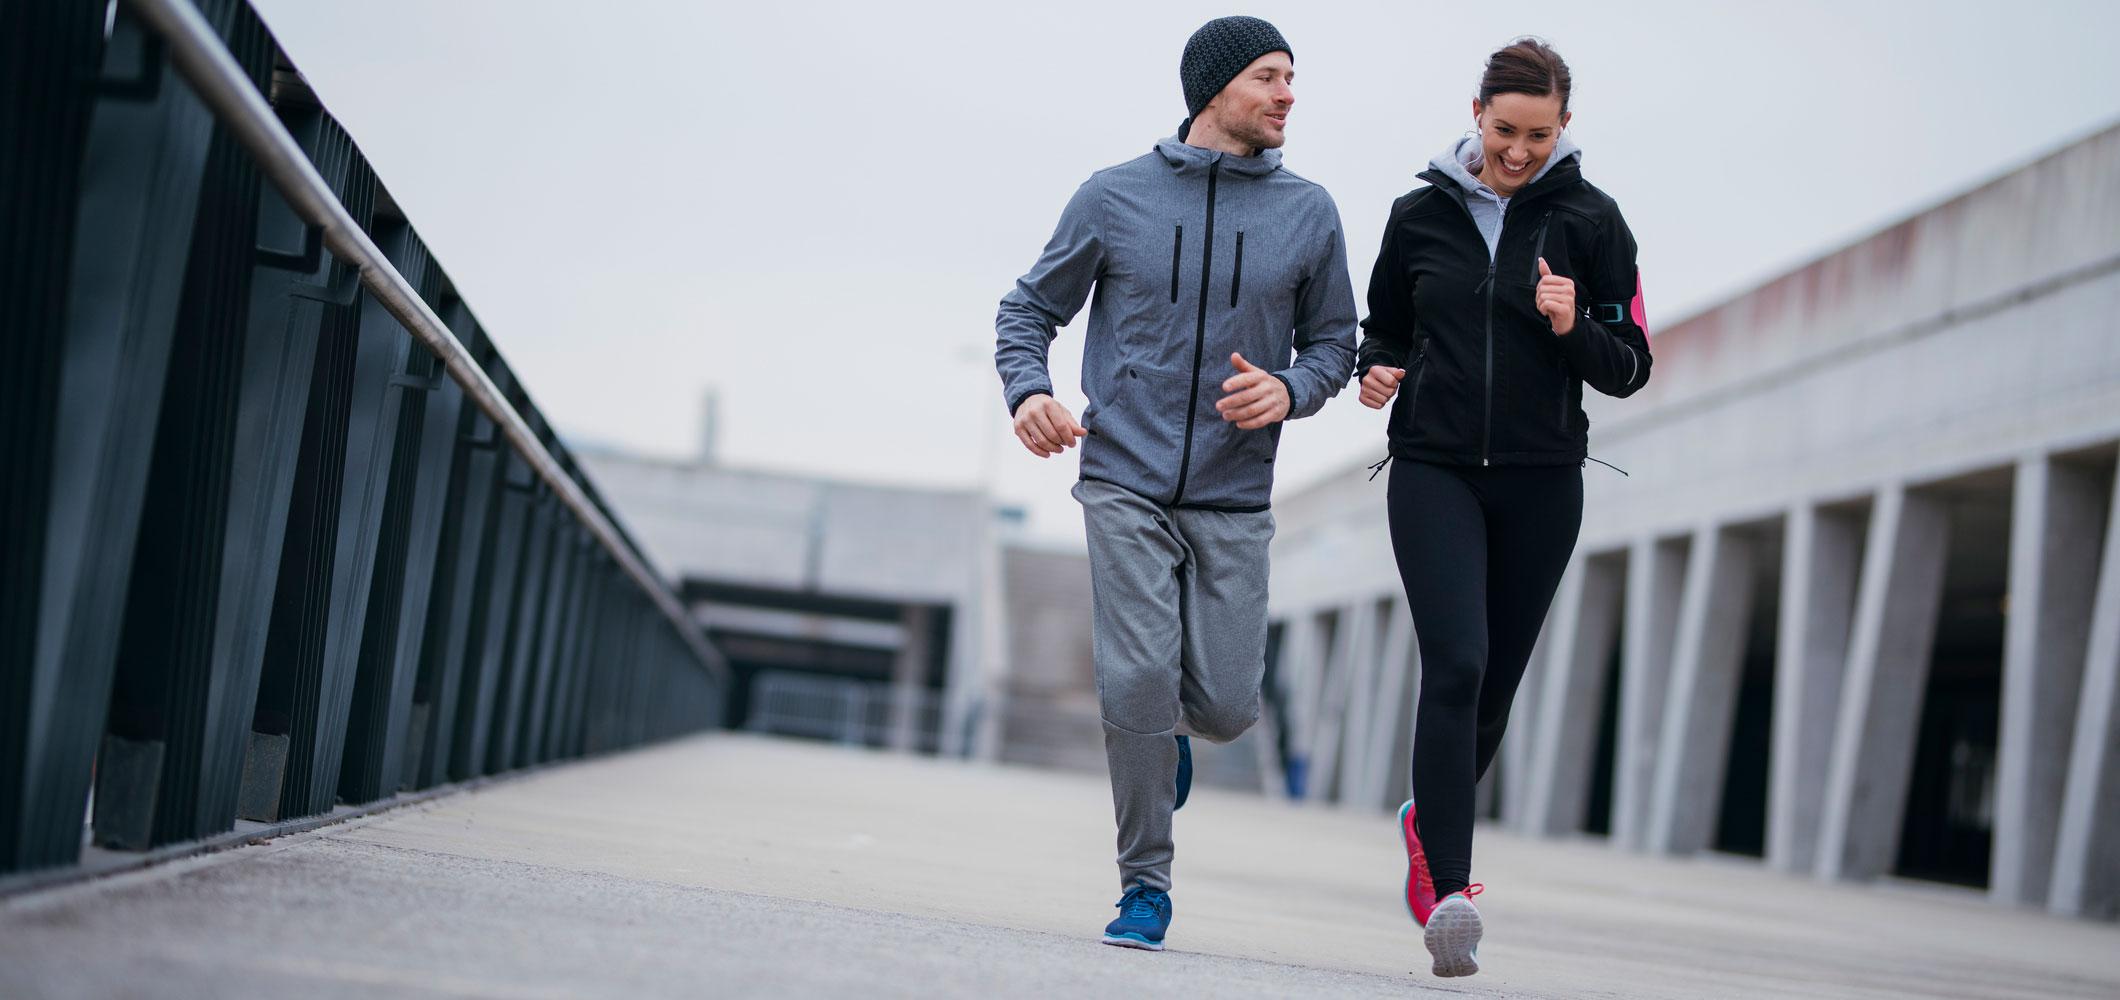 anaerobic vs aerobic man doing dips woman running